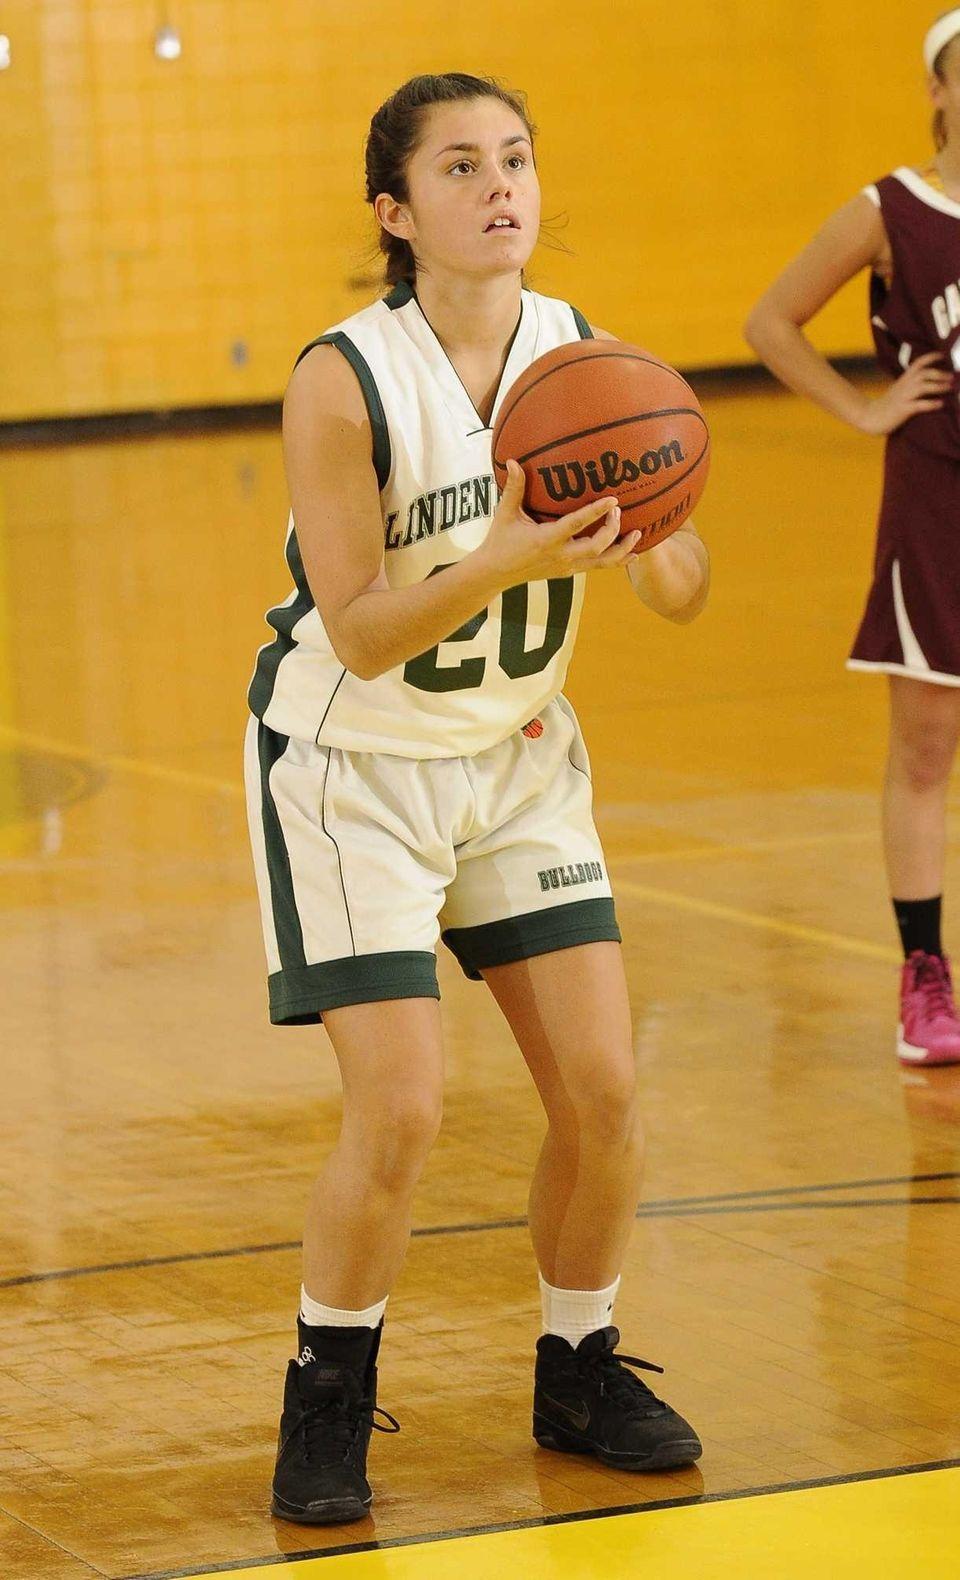 Lindenhurst's Ariana Irizarry shoots a free throw during